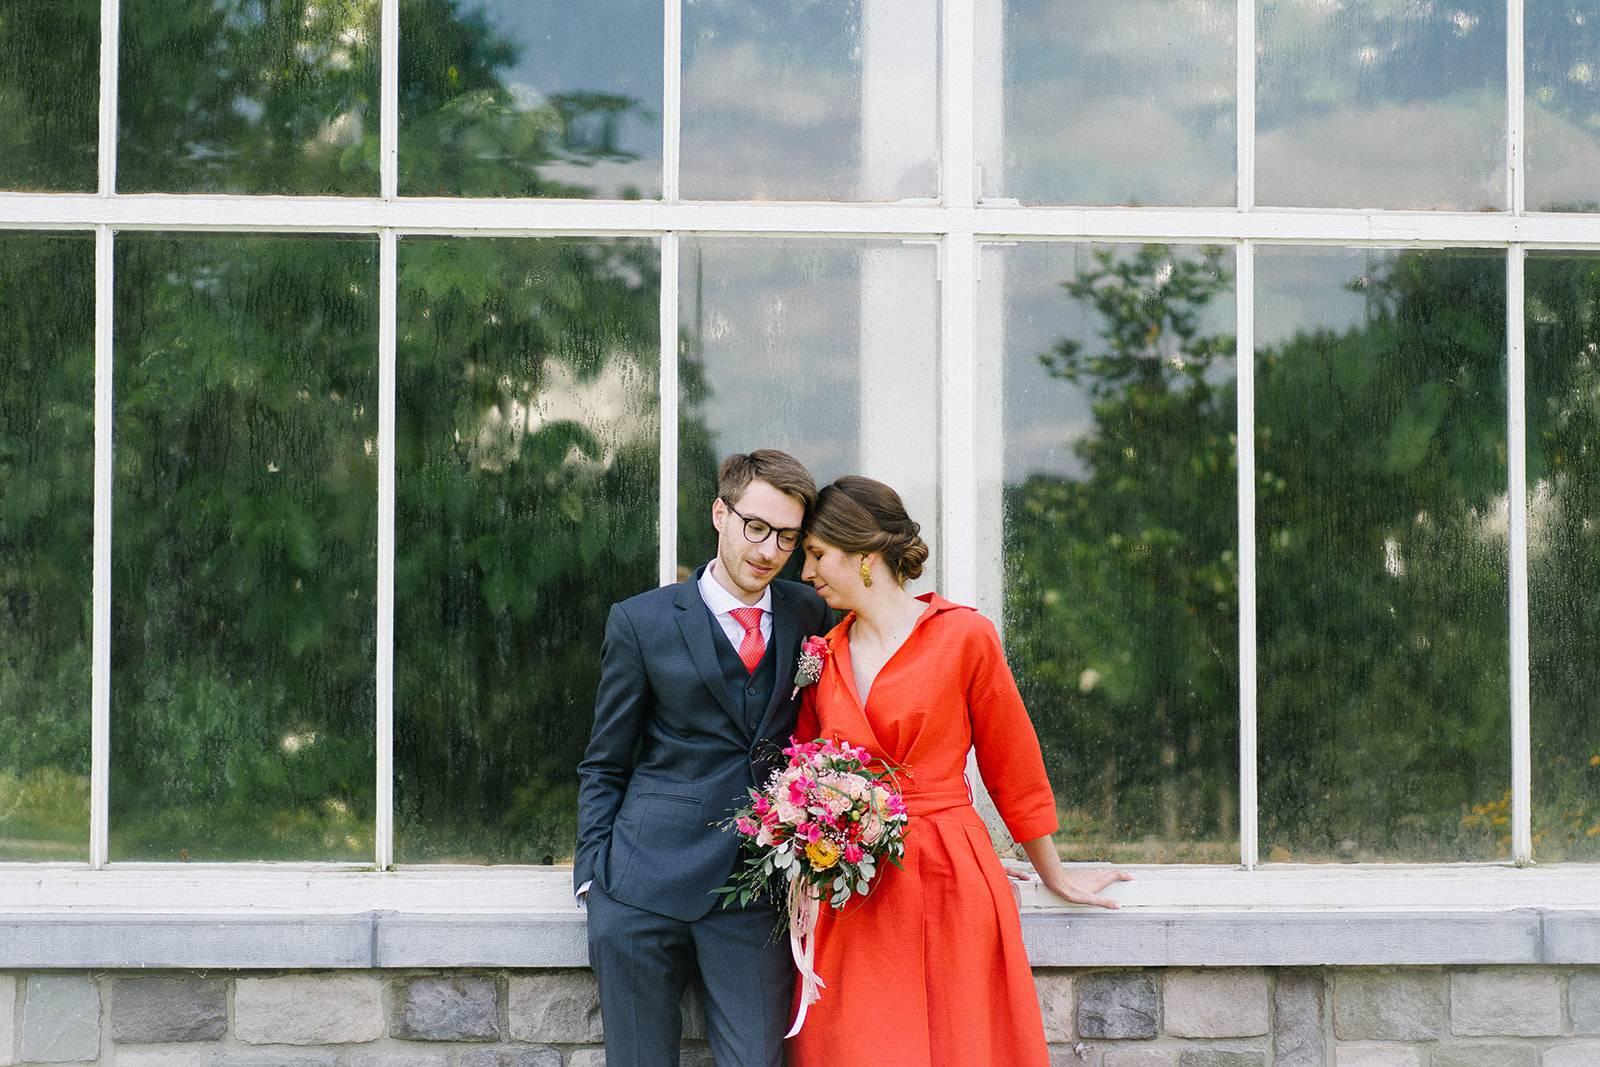 Hilde Eyckmans - CharlotteToon55mm - Hilde Eyckmans-454 - House of Weddings